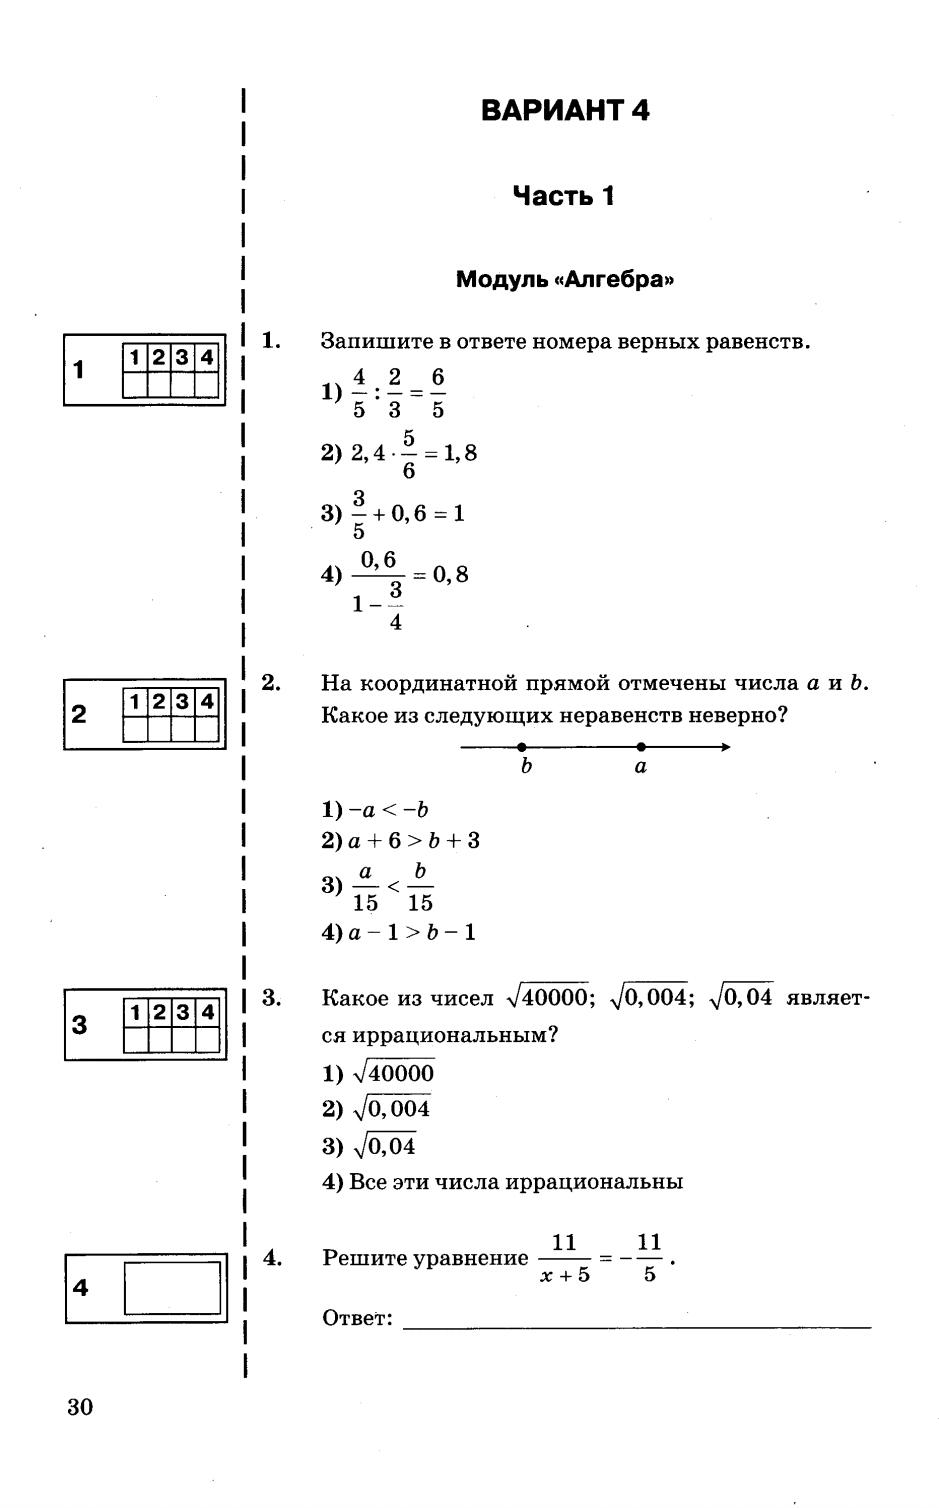 https://docs.google.com/viewer?pid=explorer&srcid=0Bw_f54pvrxEtbldKNGgyaFE3TDg&chrome=false&docid=e803bf4555b2fe7a8e01072ad16bc93b%7Cc9acad21277b9c8c76d1236b5bcea6e2&a=bi&pagenumber=31&w=939